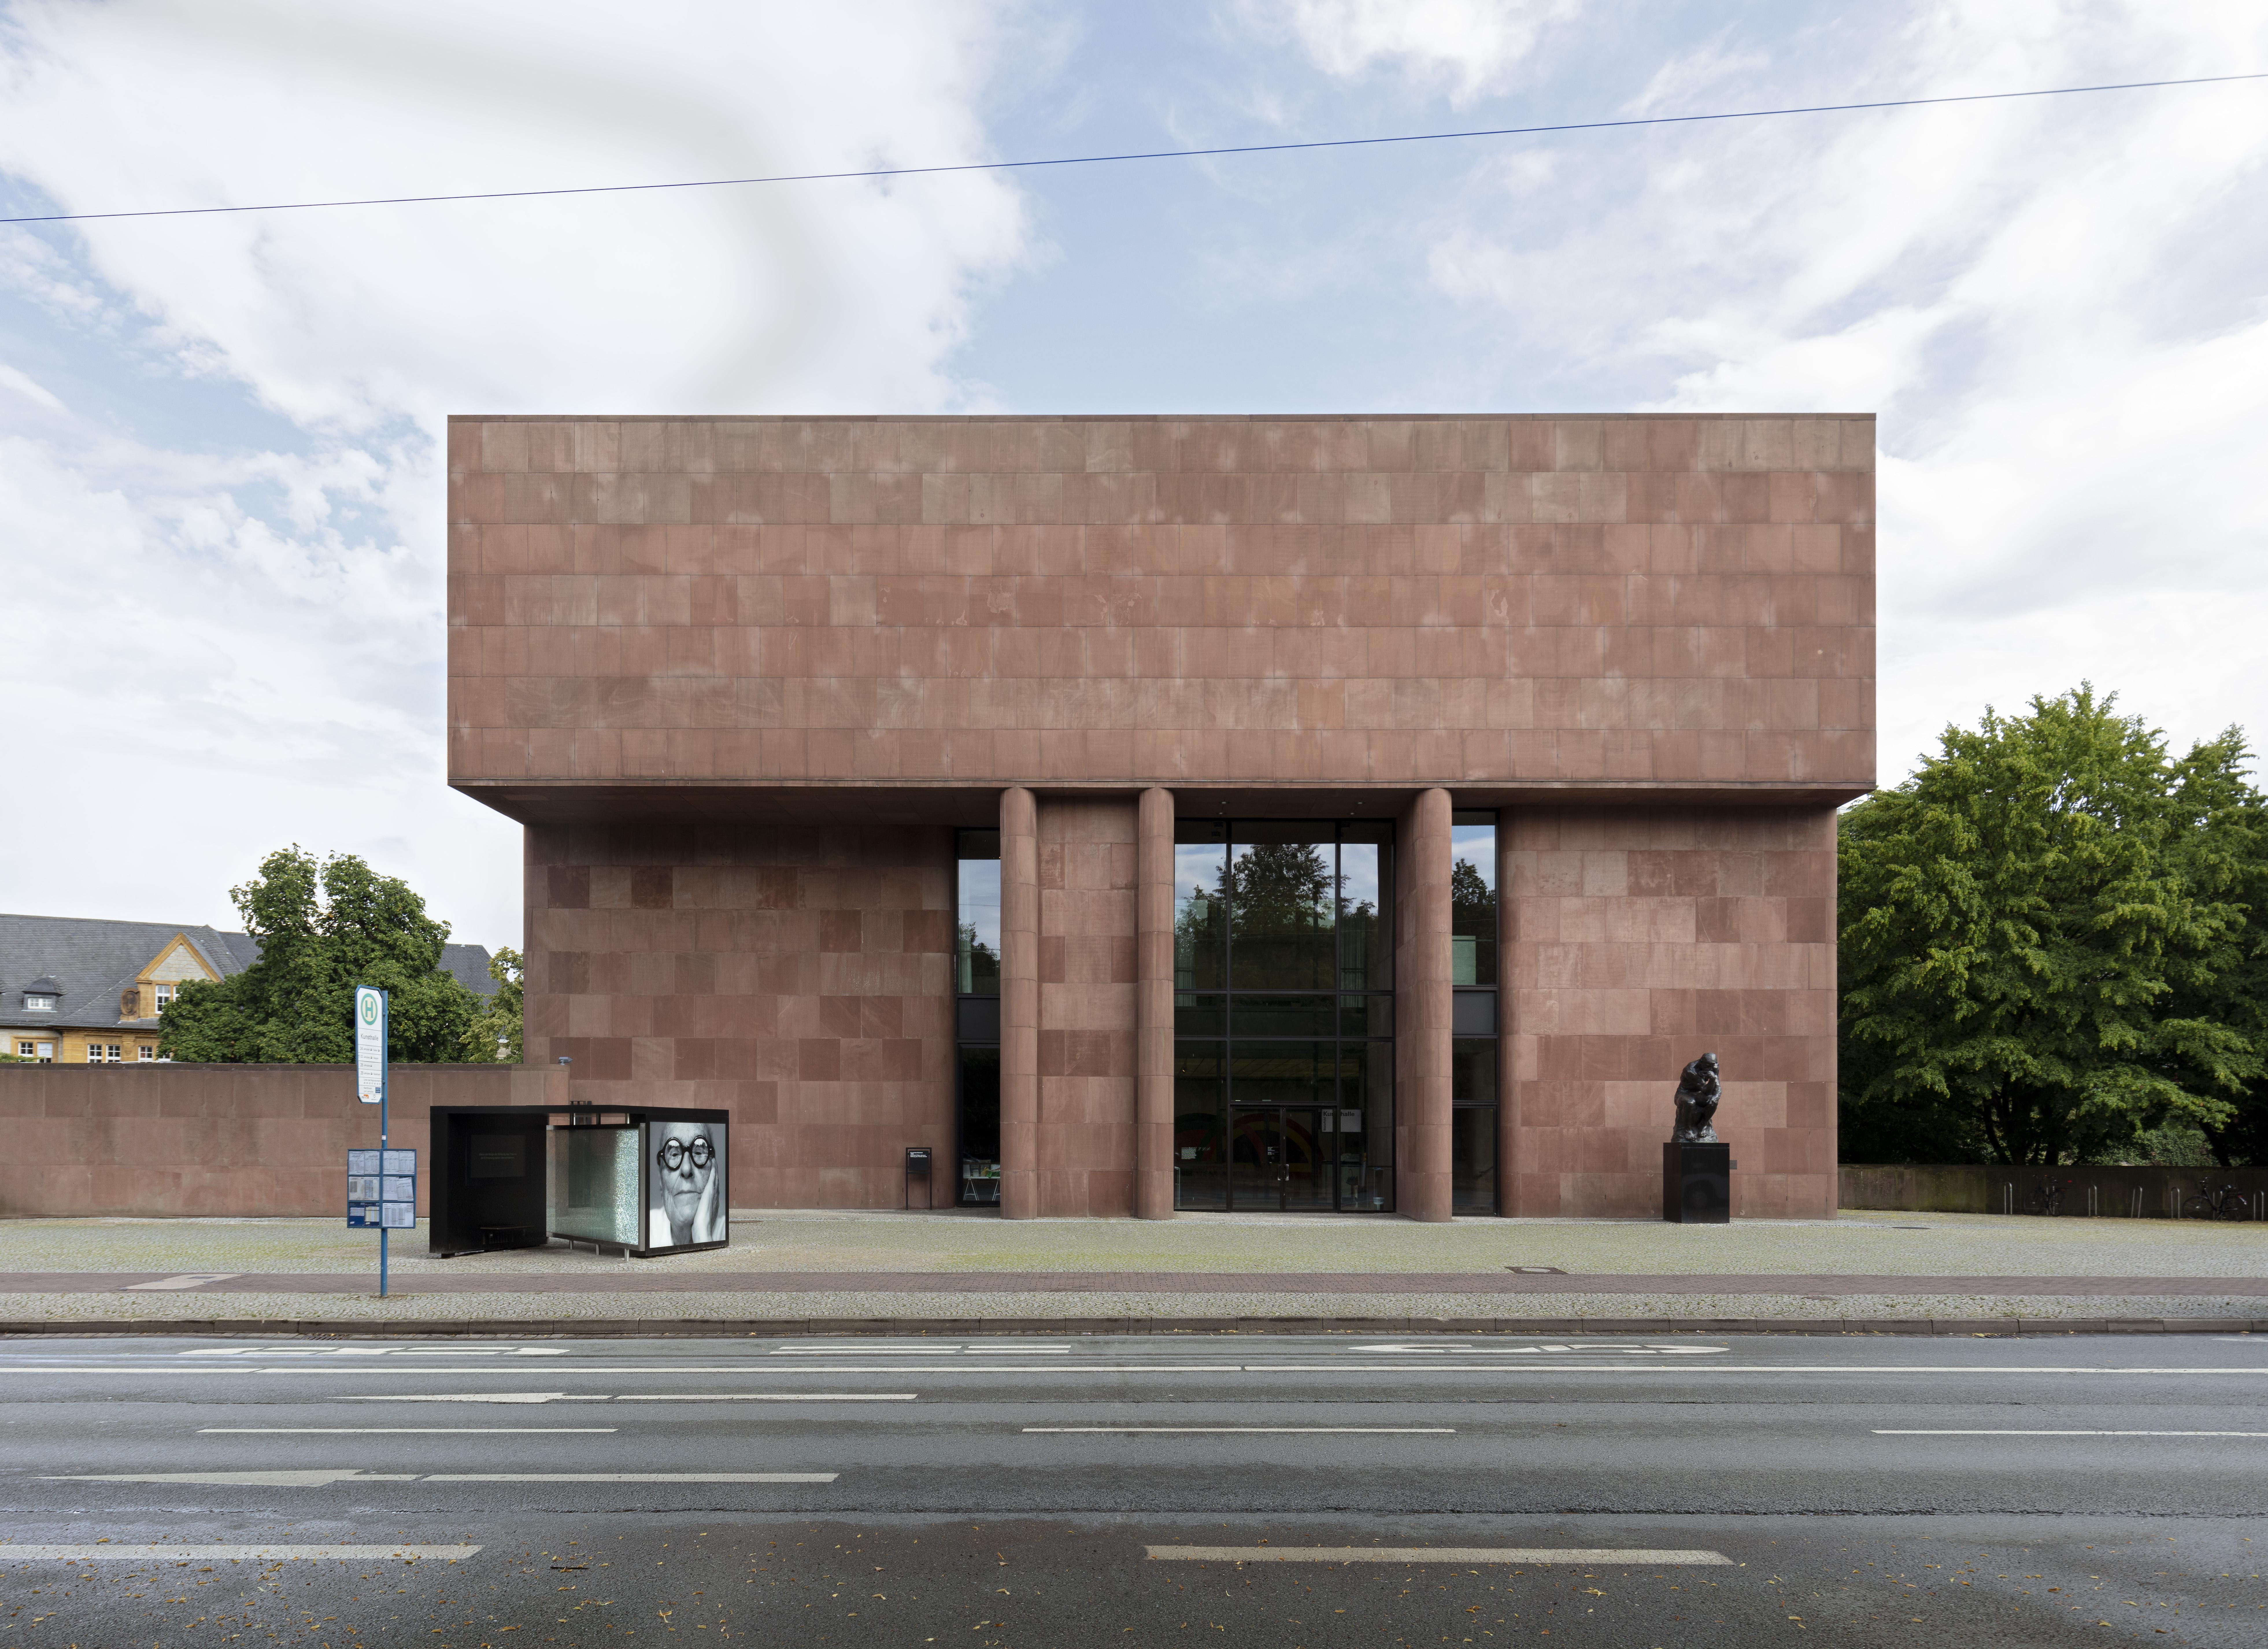 File Kunsthalle Bielefeld 2019 Jpg Wikimedia Commons